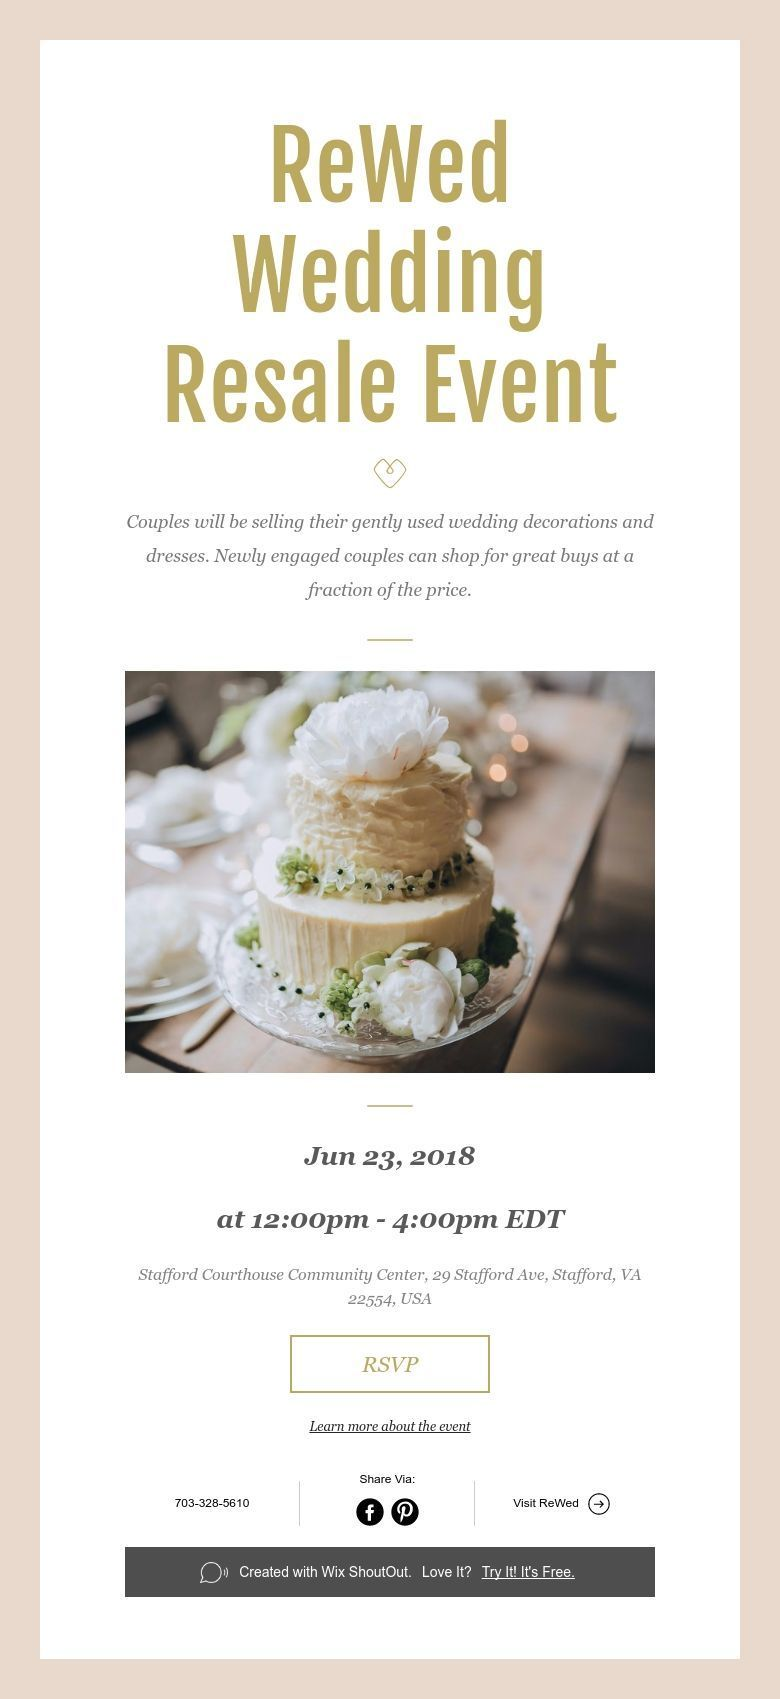 Rewed Wedding Resale Event Event Wedding Resale